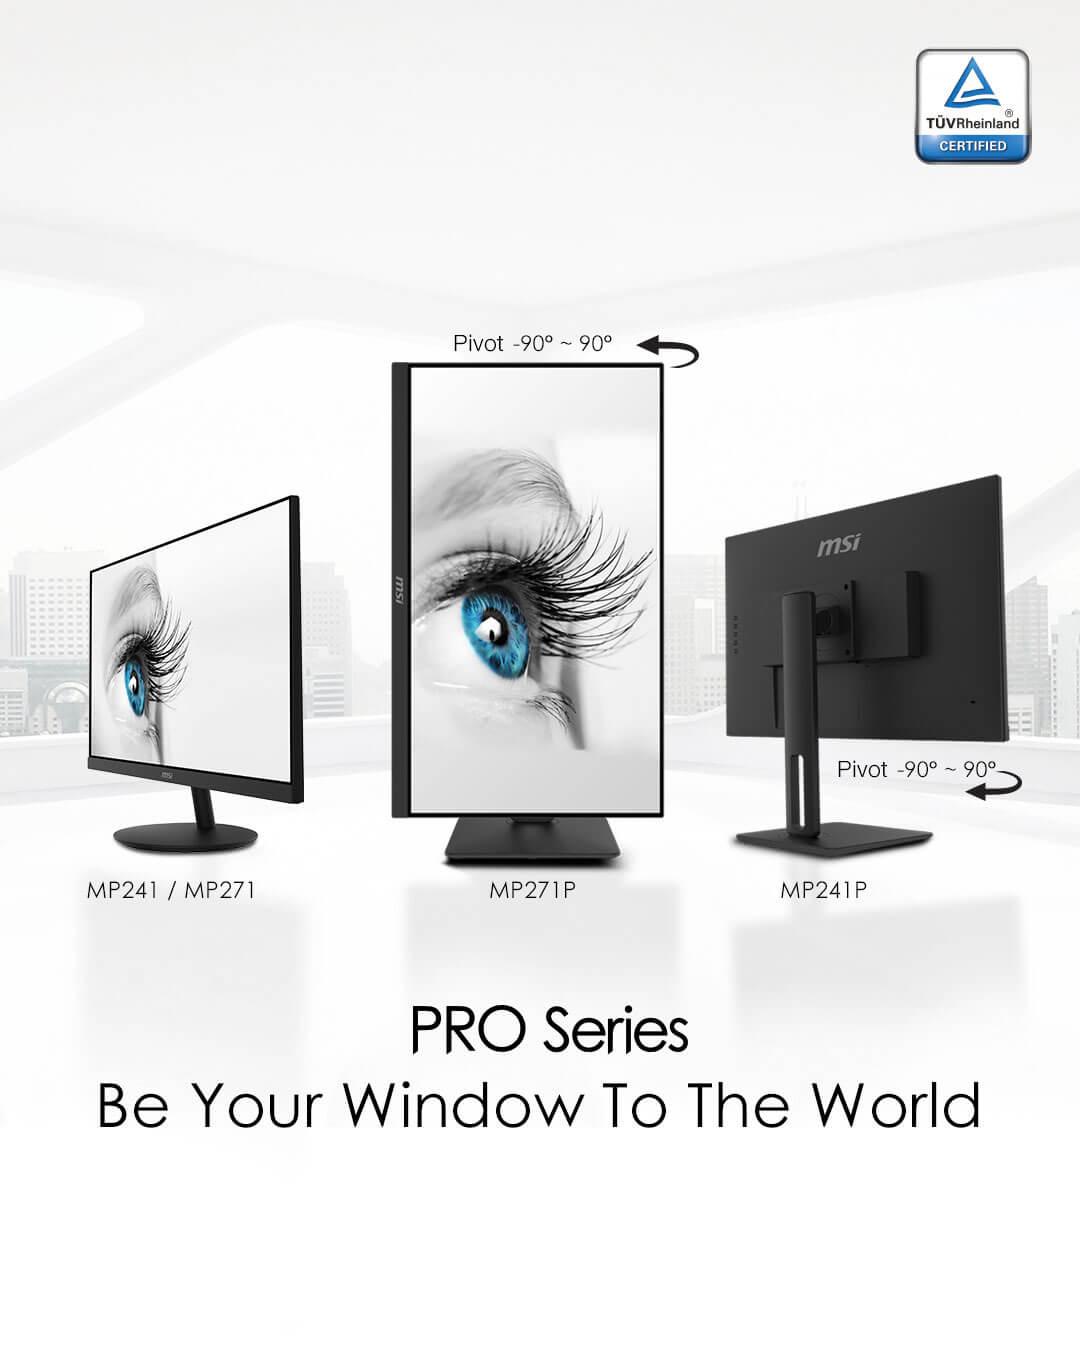 msi Pro MP Series